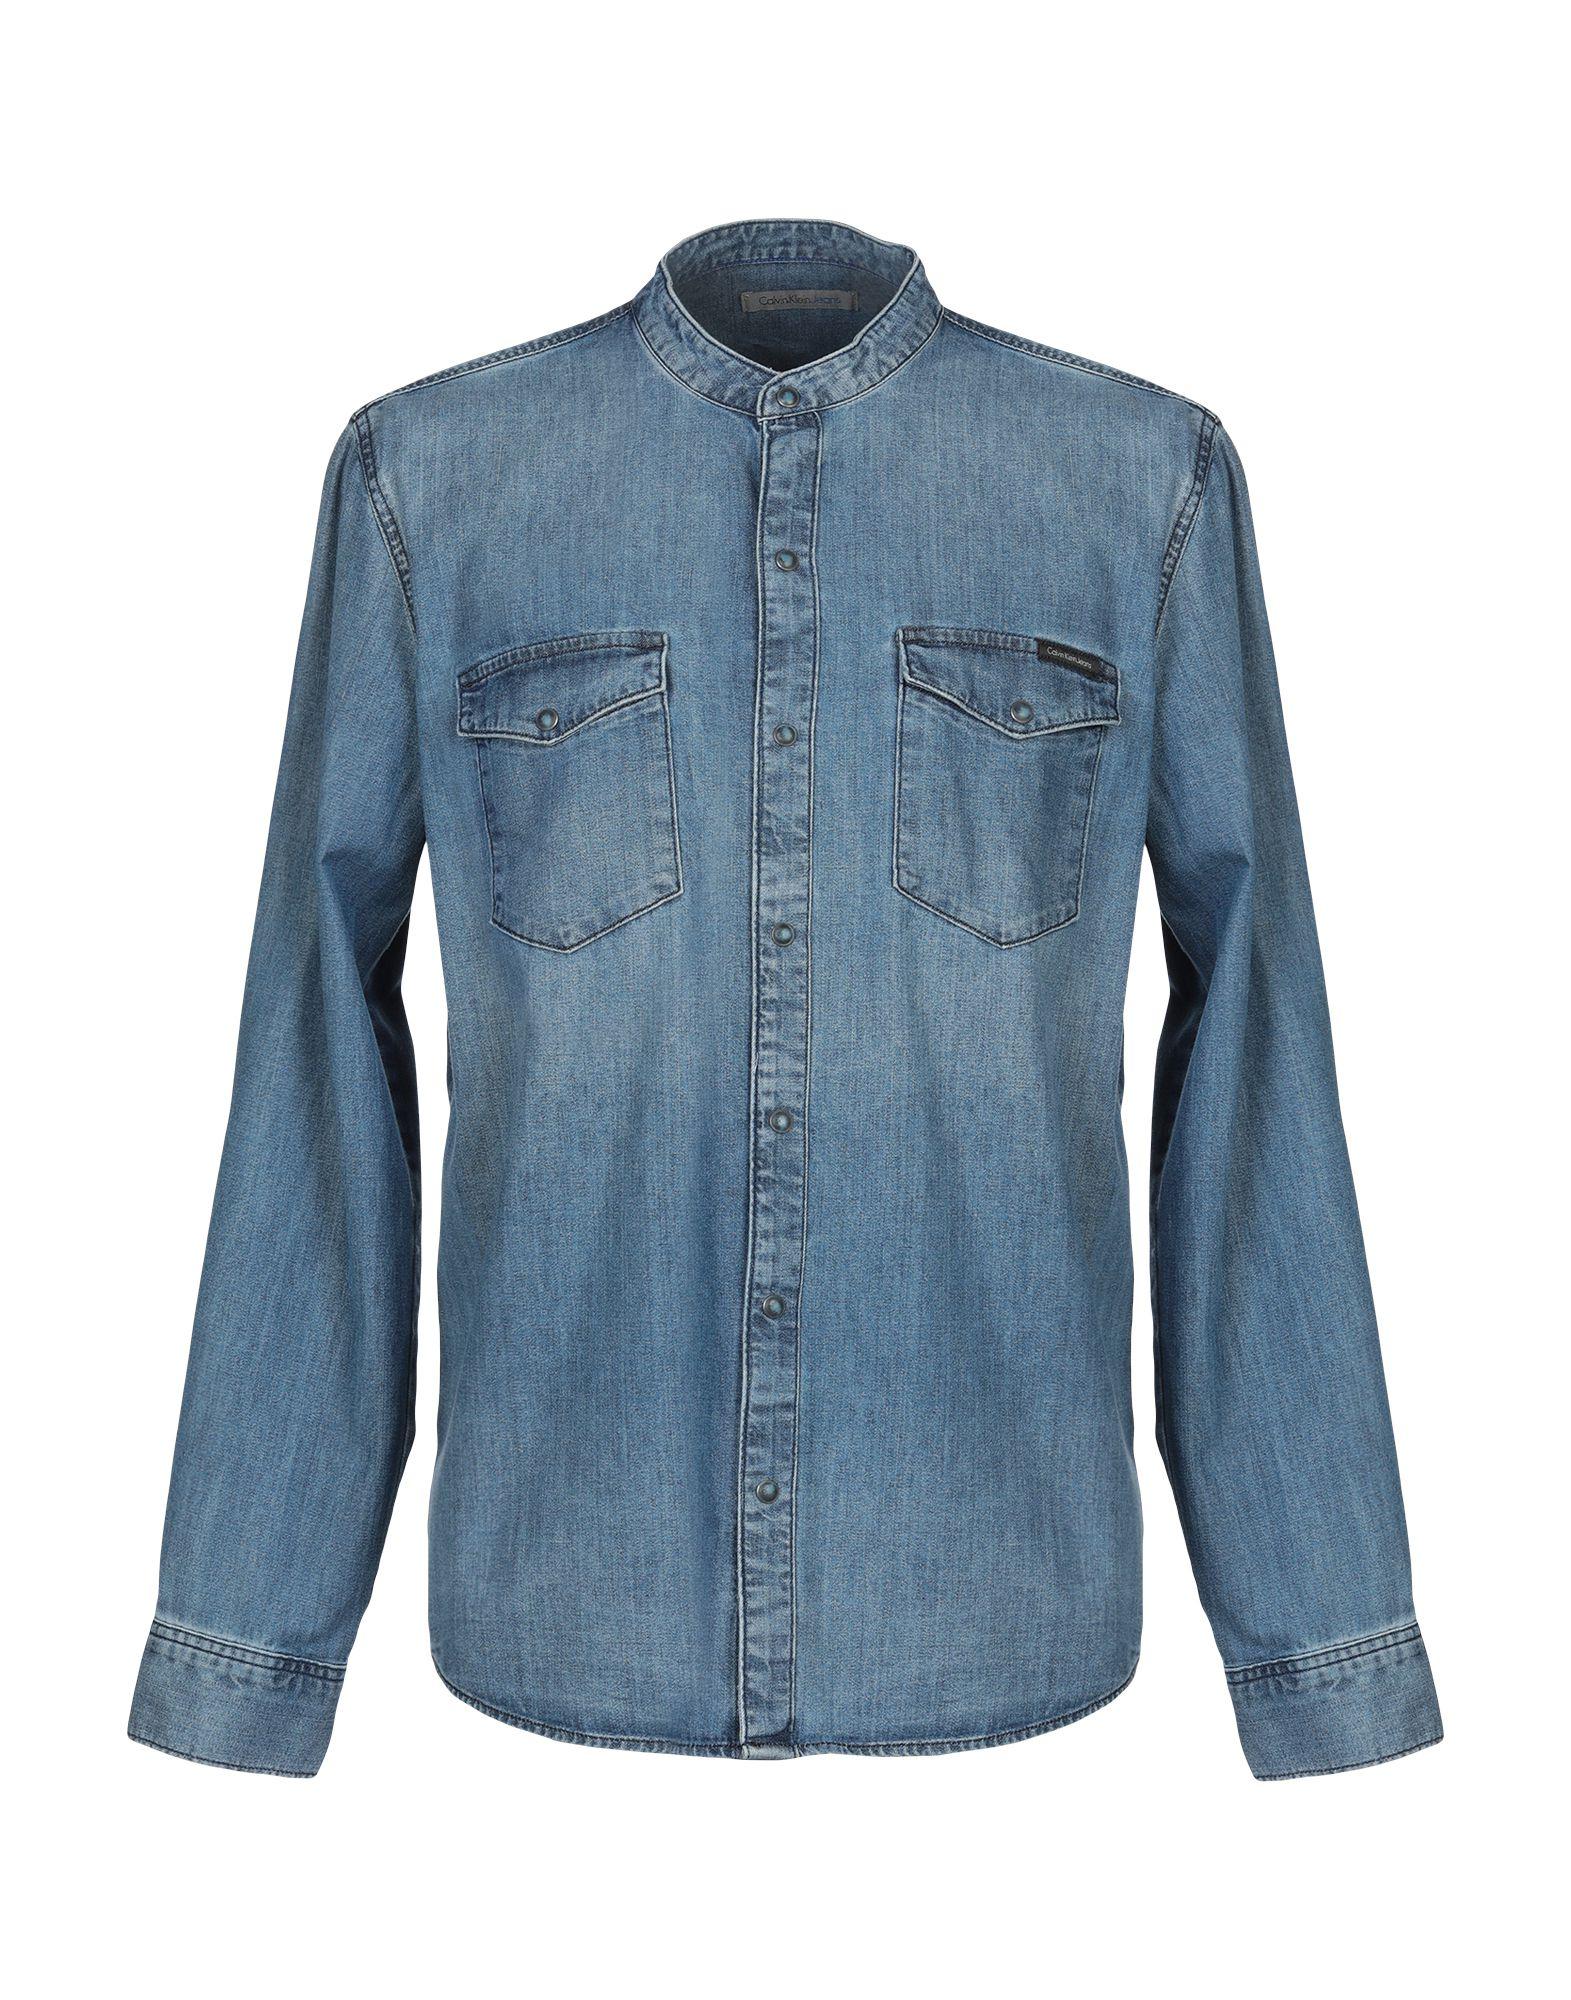 цена на CALVIN KLEIN JEANS Джинсовая рубашка